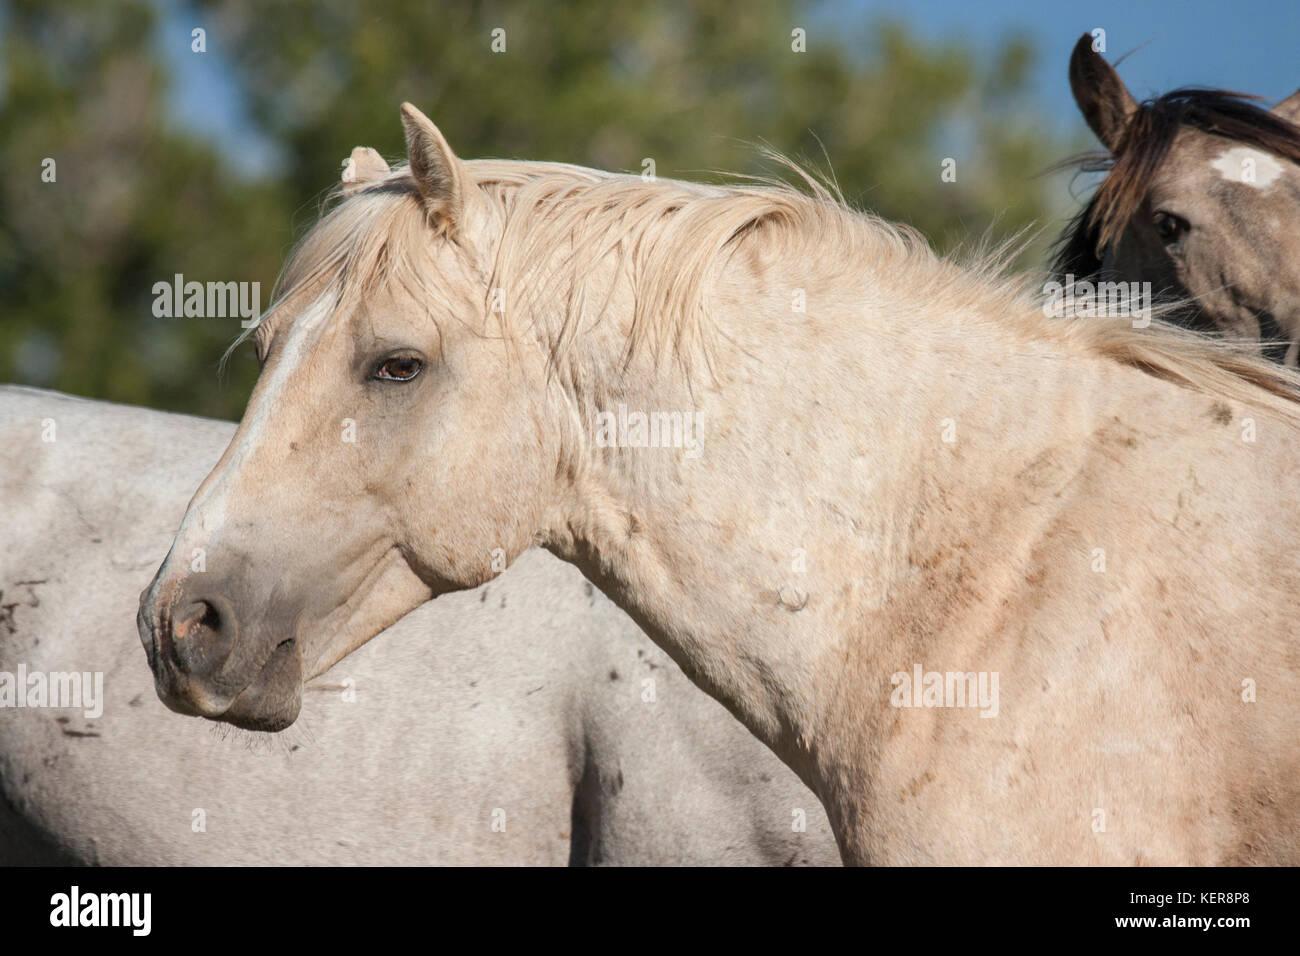 Wild mustang band stallion in Montana - Stock Image